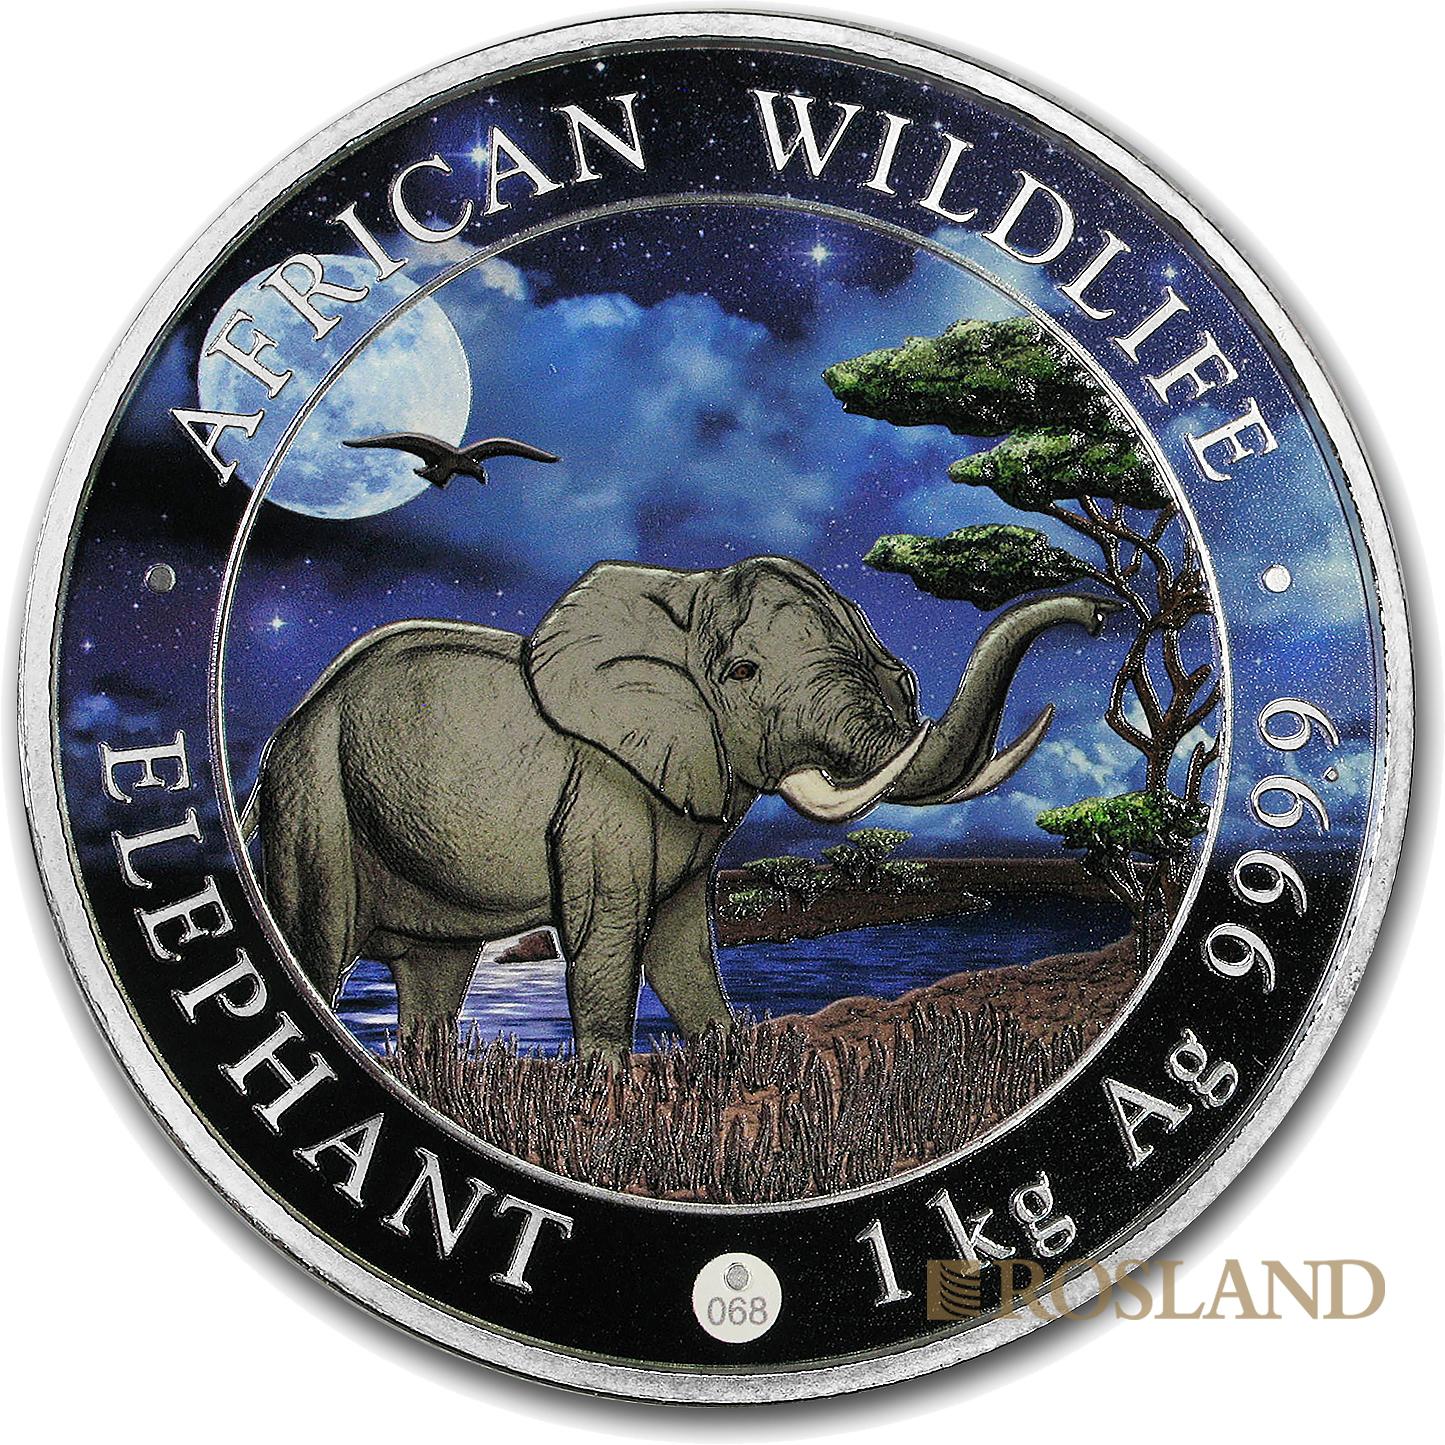 1 Kilogramm Silbermünze Somalia Elefant 2019 Riesenmond PL (Koloriert, Box, Zertifikat)